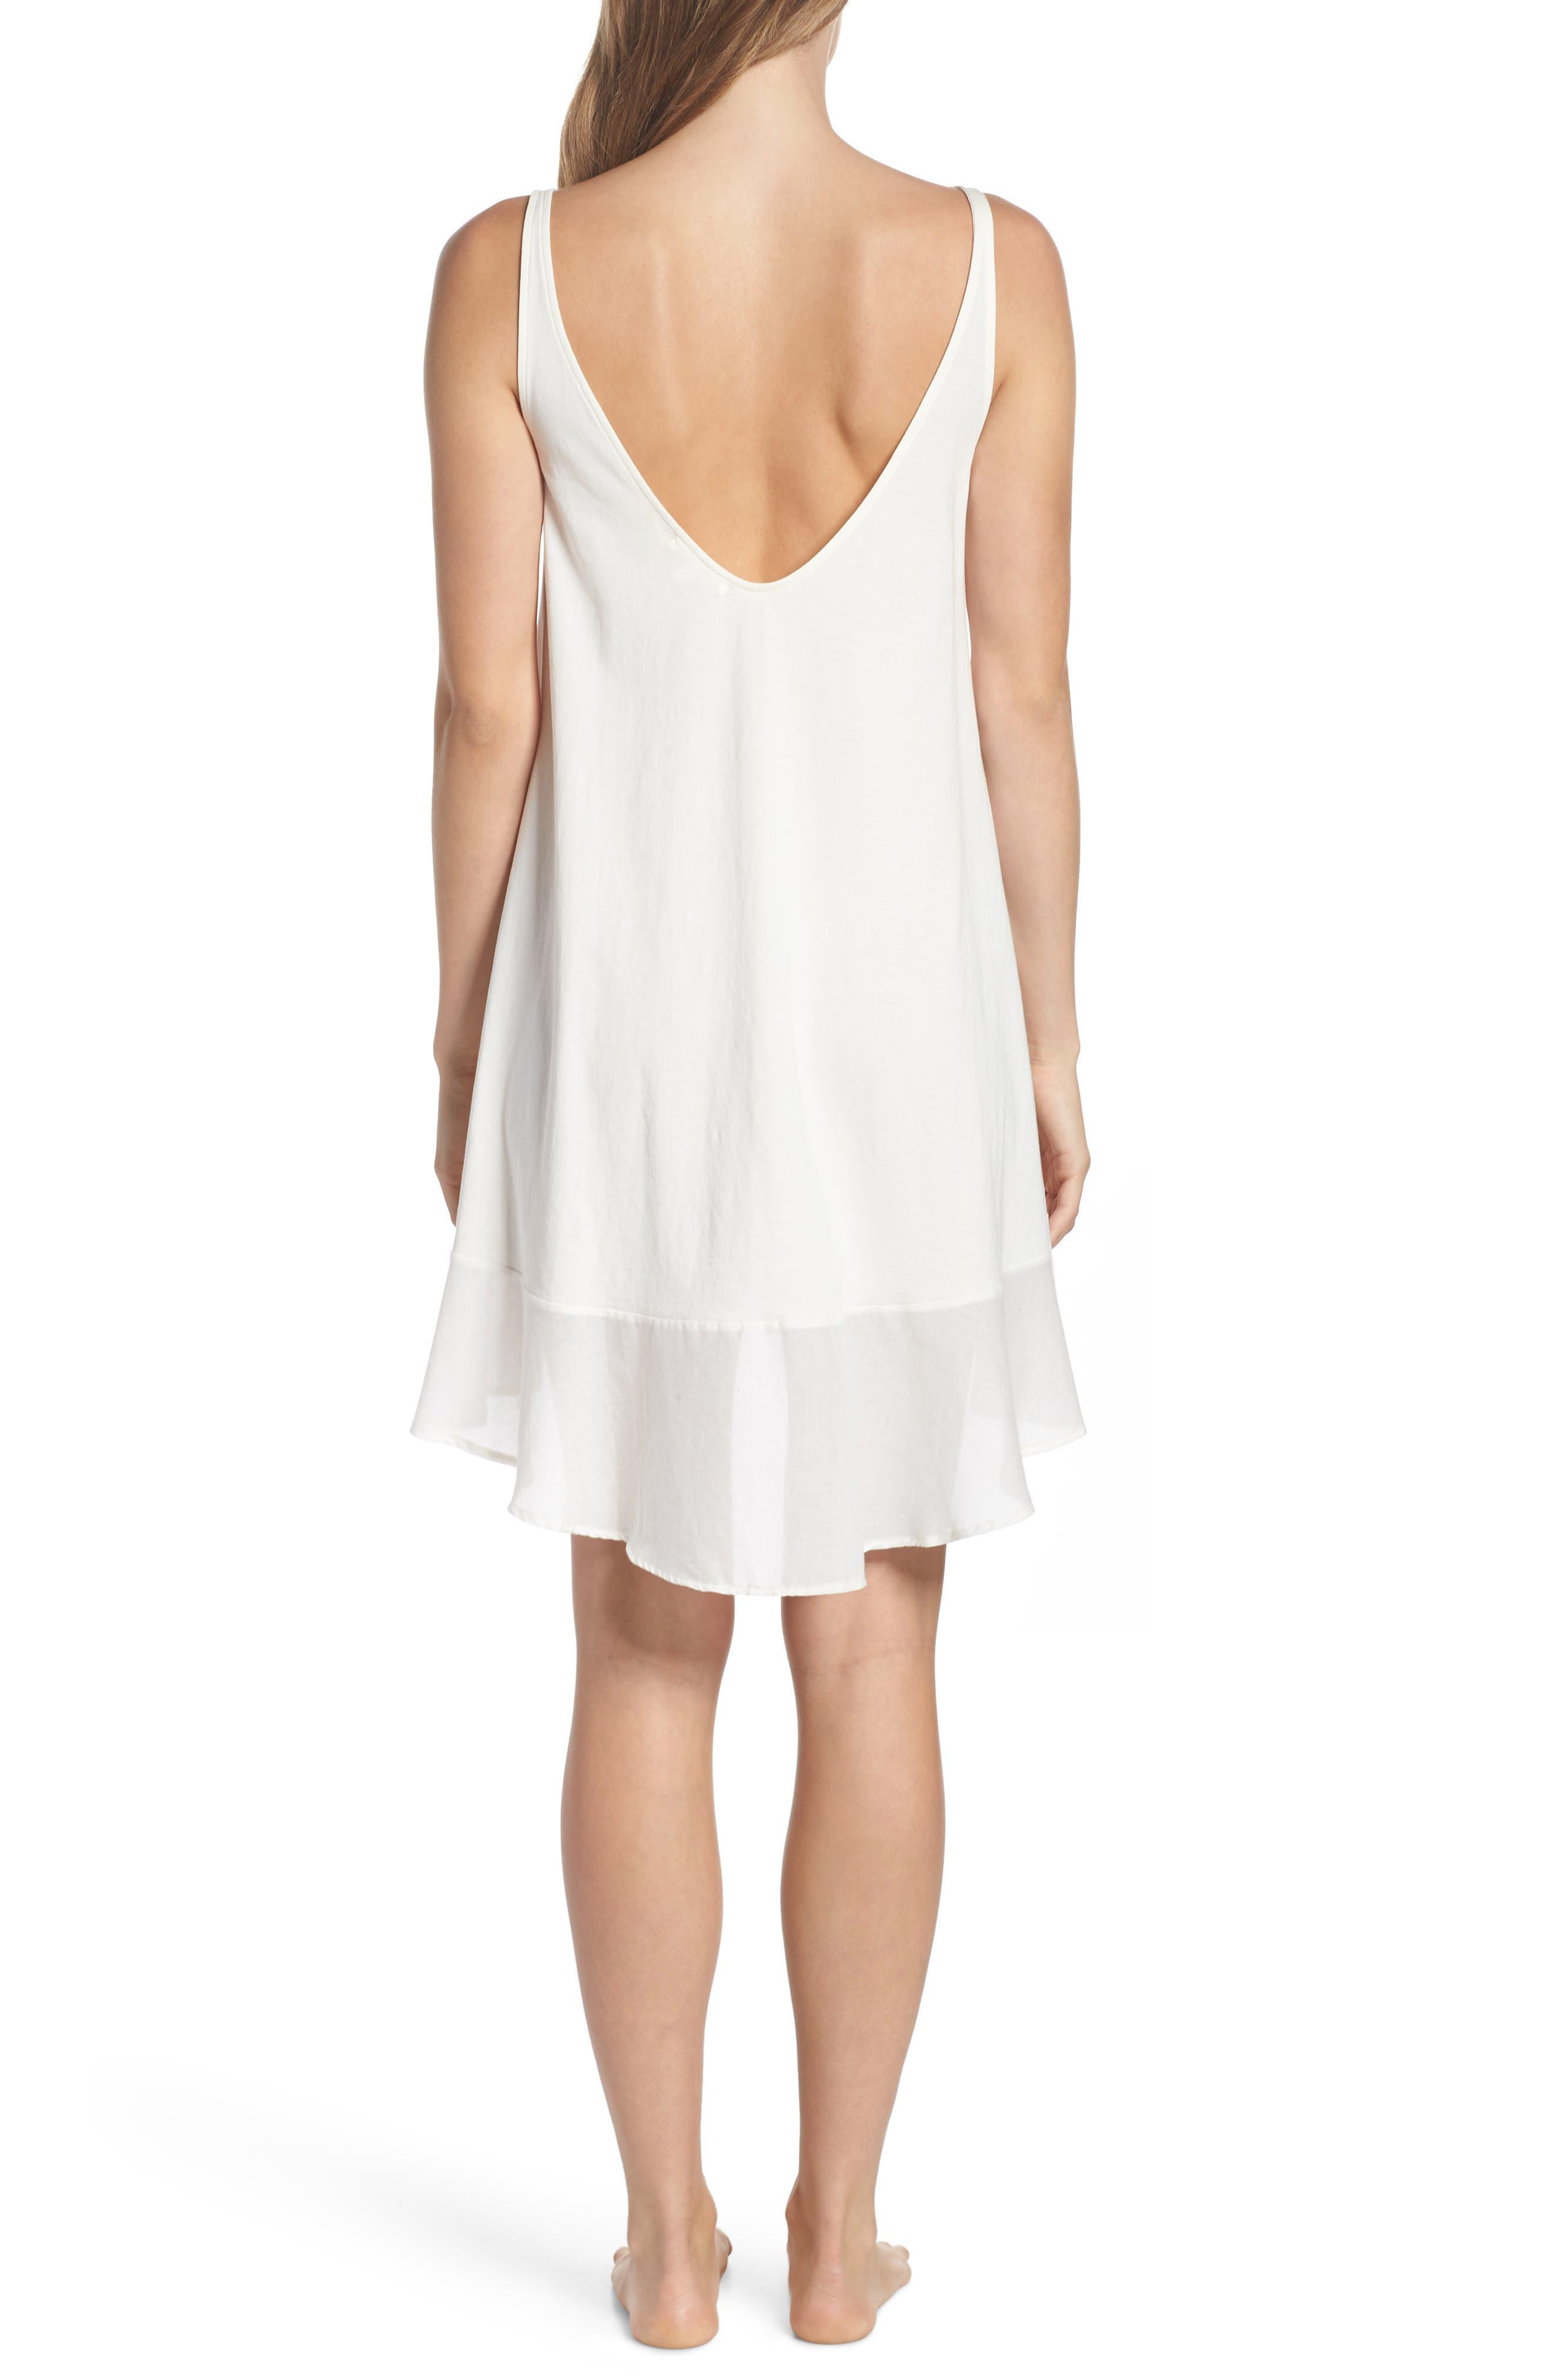 Bettina Pima Cotton Voile Nightgown,                             Alternate thumbnail 2, color,                             900